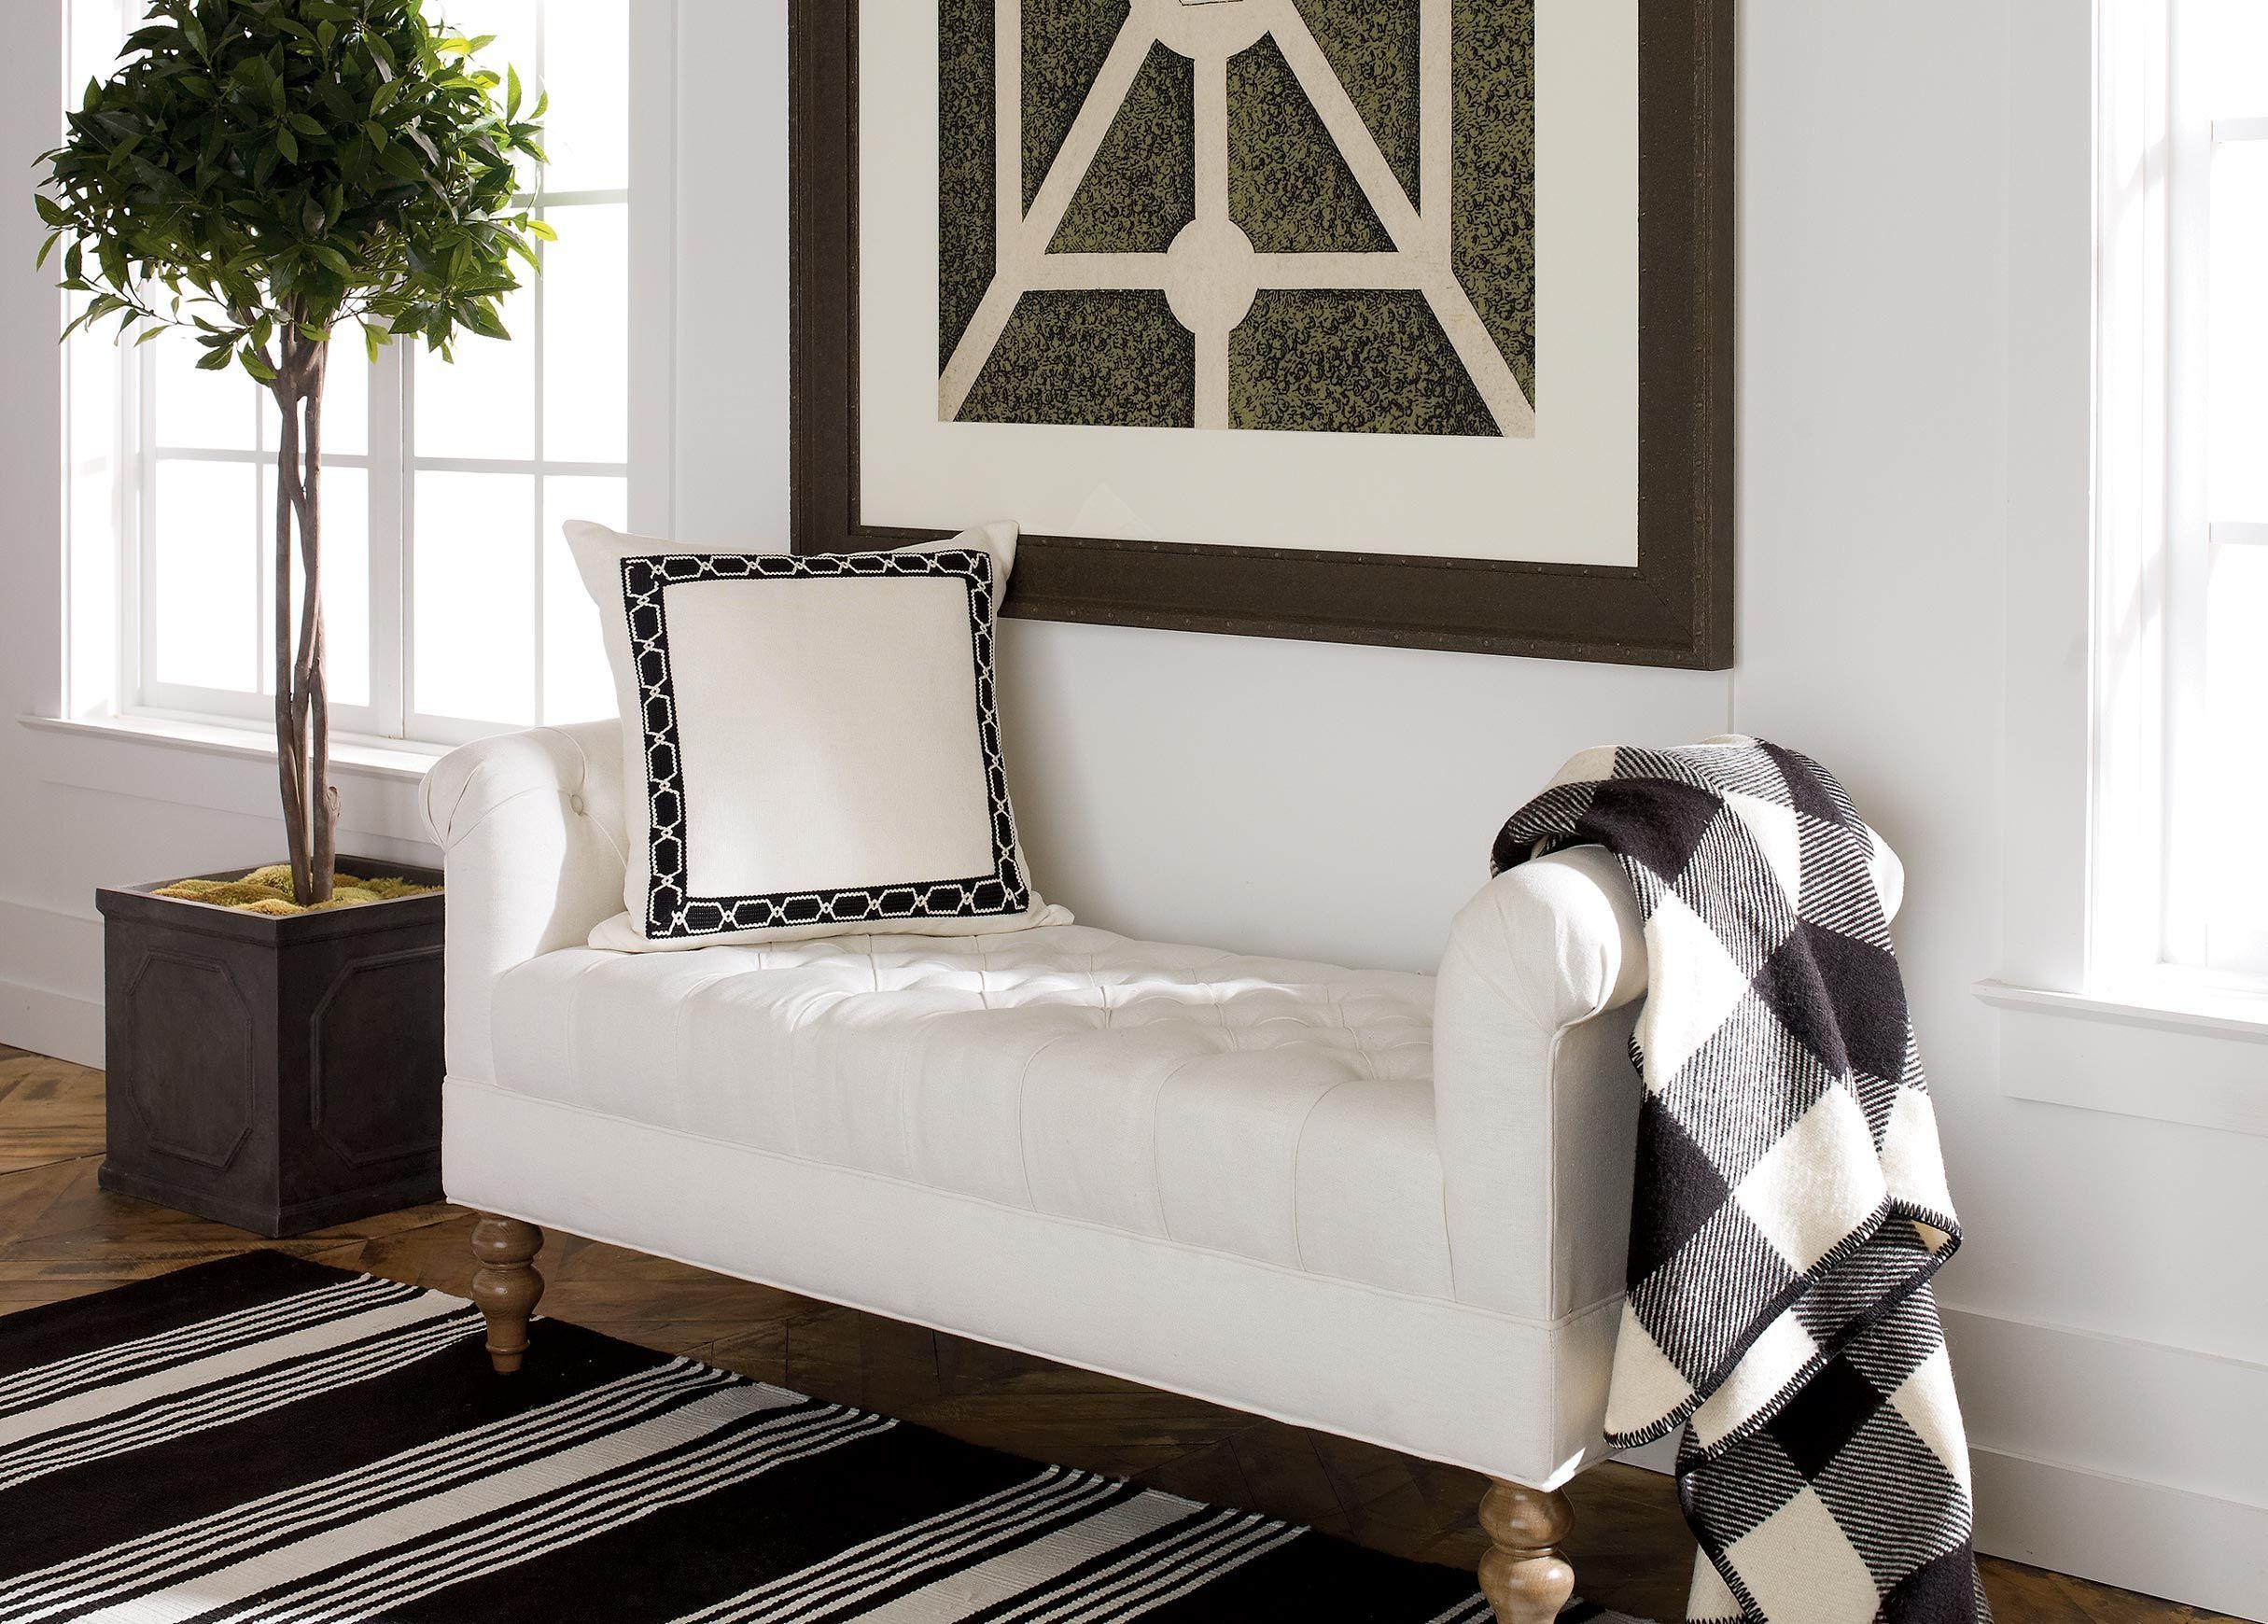 Shop New Bedroom Furniture What's New Ethan Allen